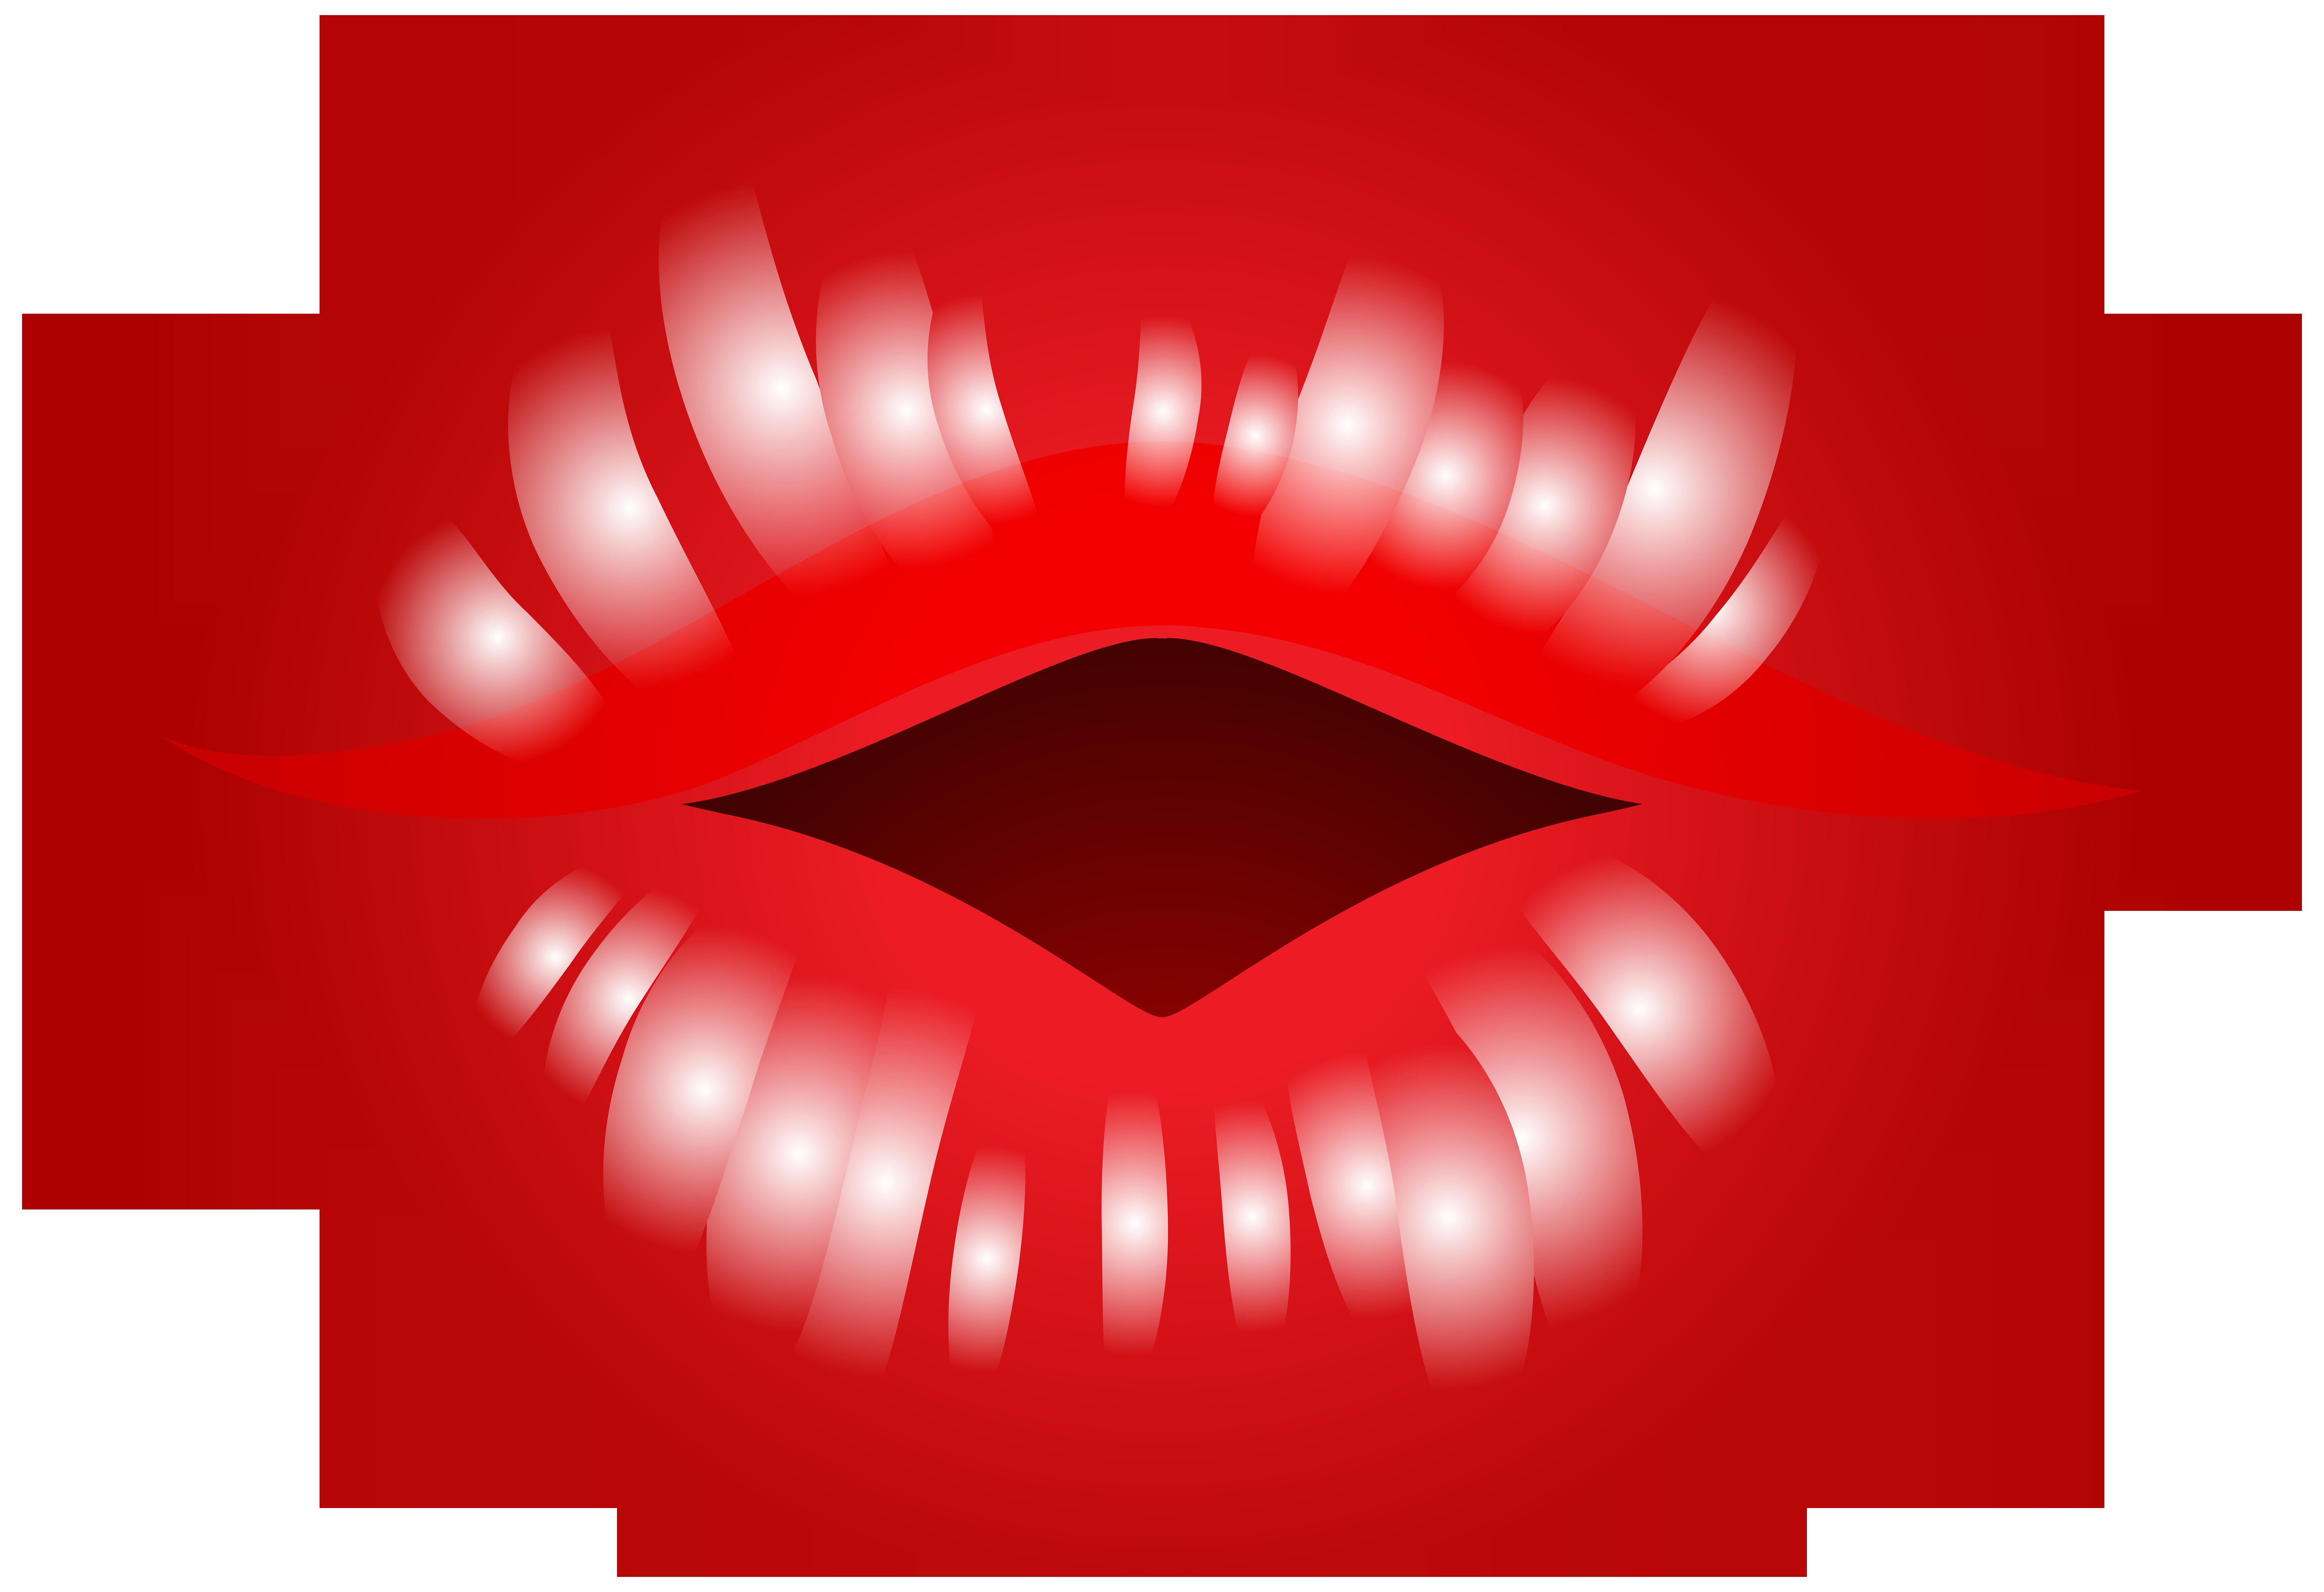 Kiss Lips PNG Clip Art Image.